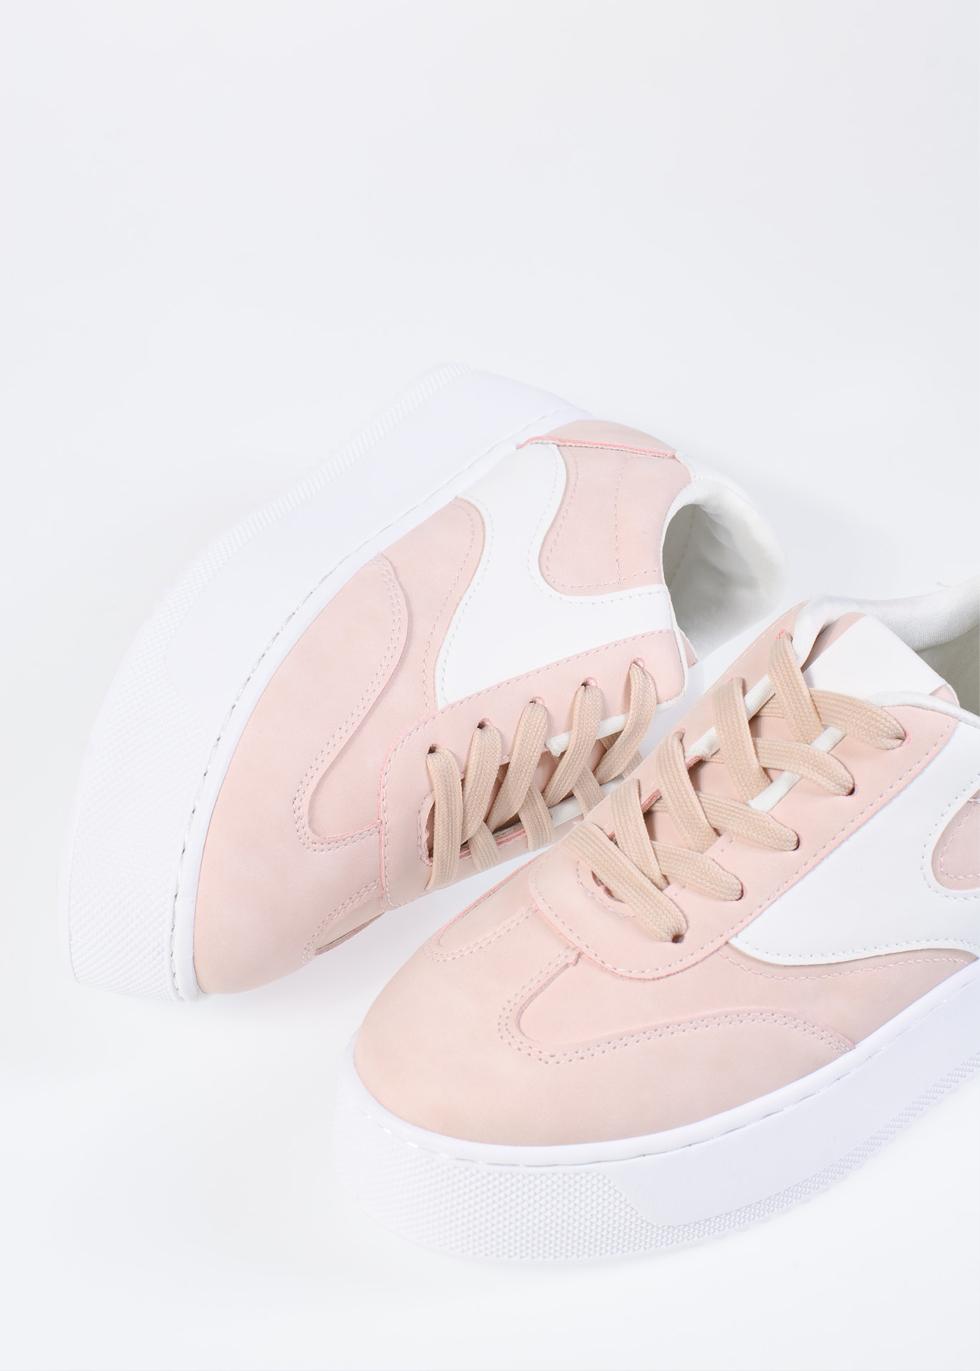 Madel ματ sneaker, baby pink